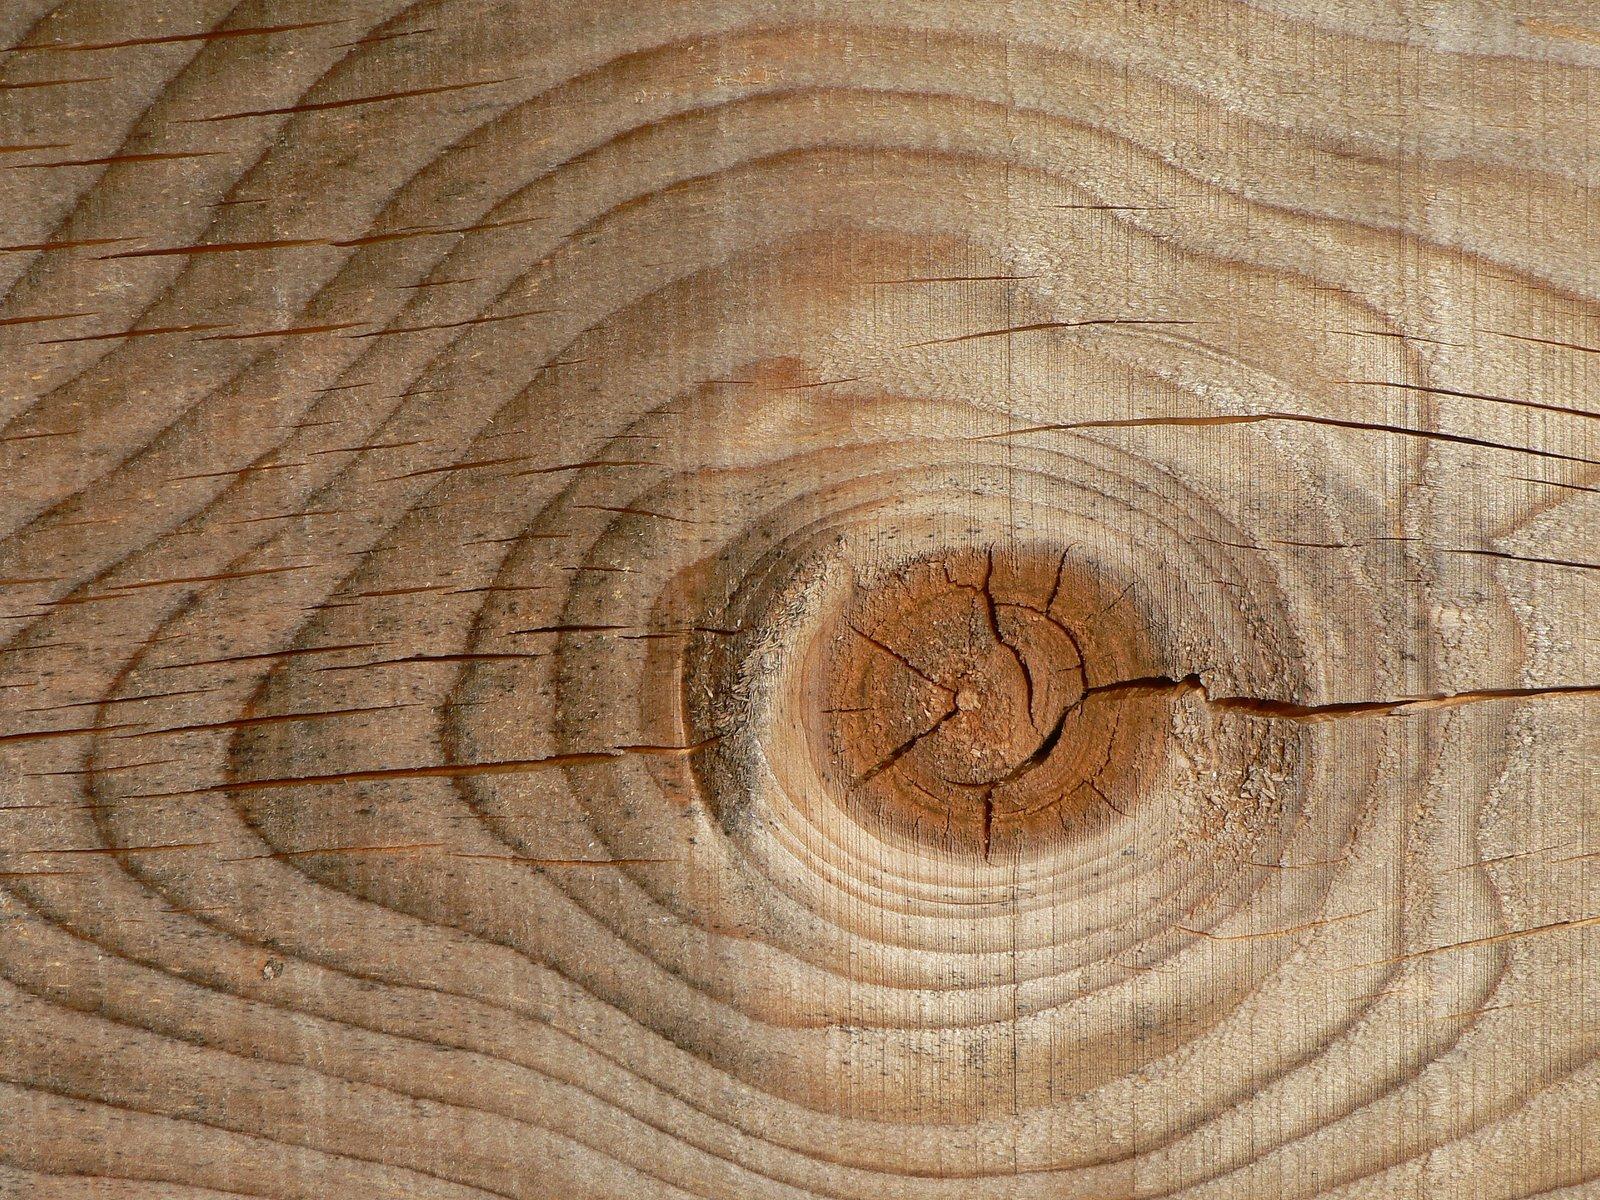 Arquirehab la madera el material sostenible for Fotos en madera